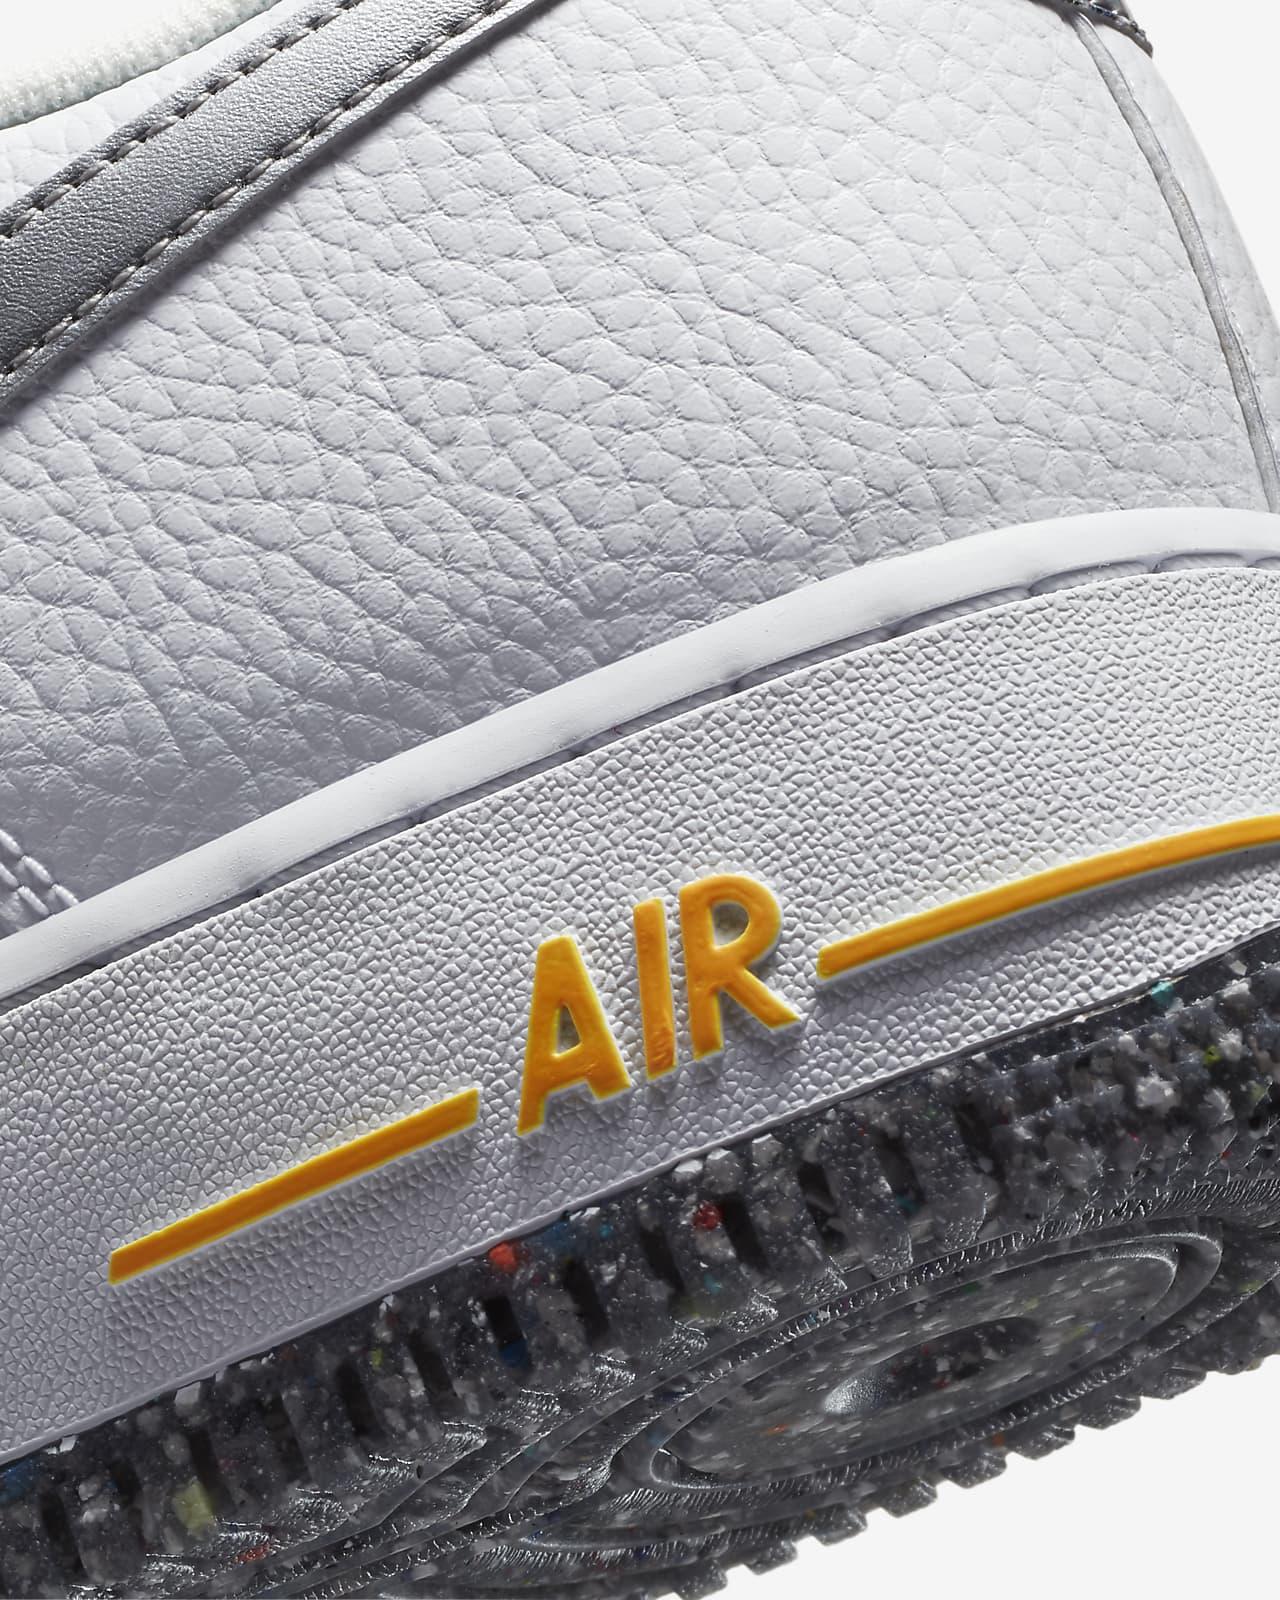 Nike Air Force 1'07 LV8 Sport Spurs Baskets Pour Homme